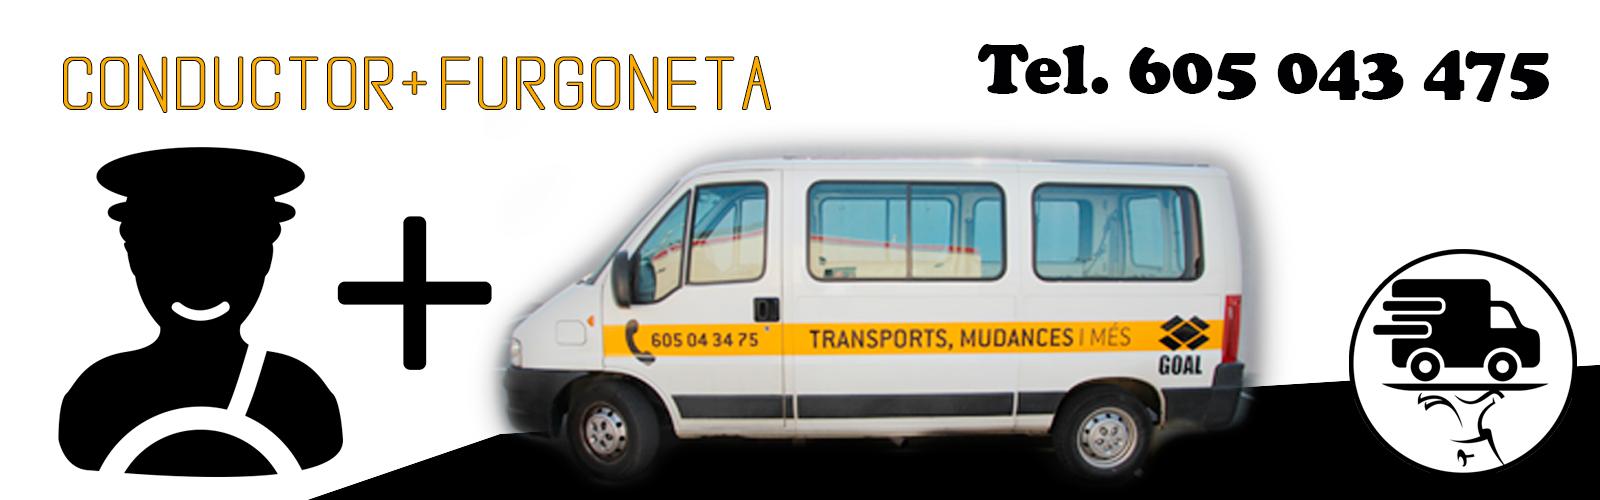 furgoneta + conductor